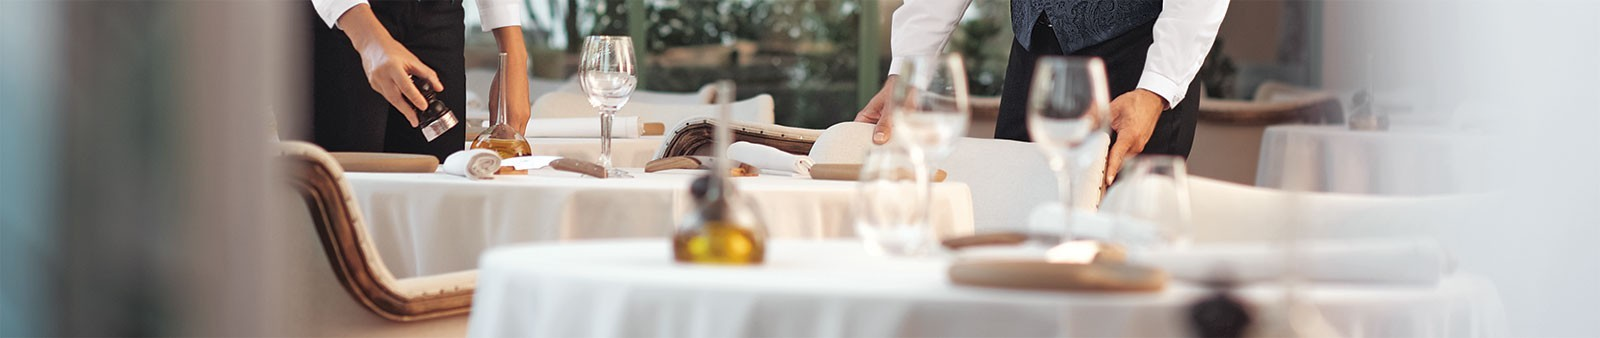 Oberteile - Service & Hotellerie